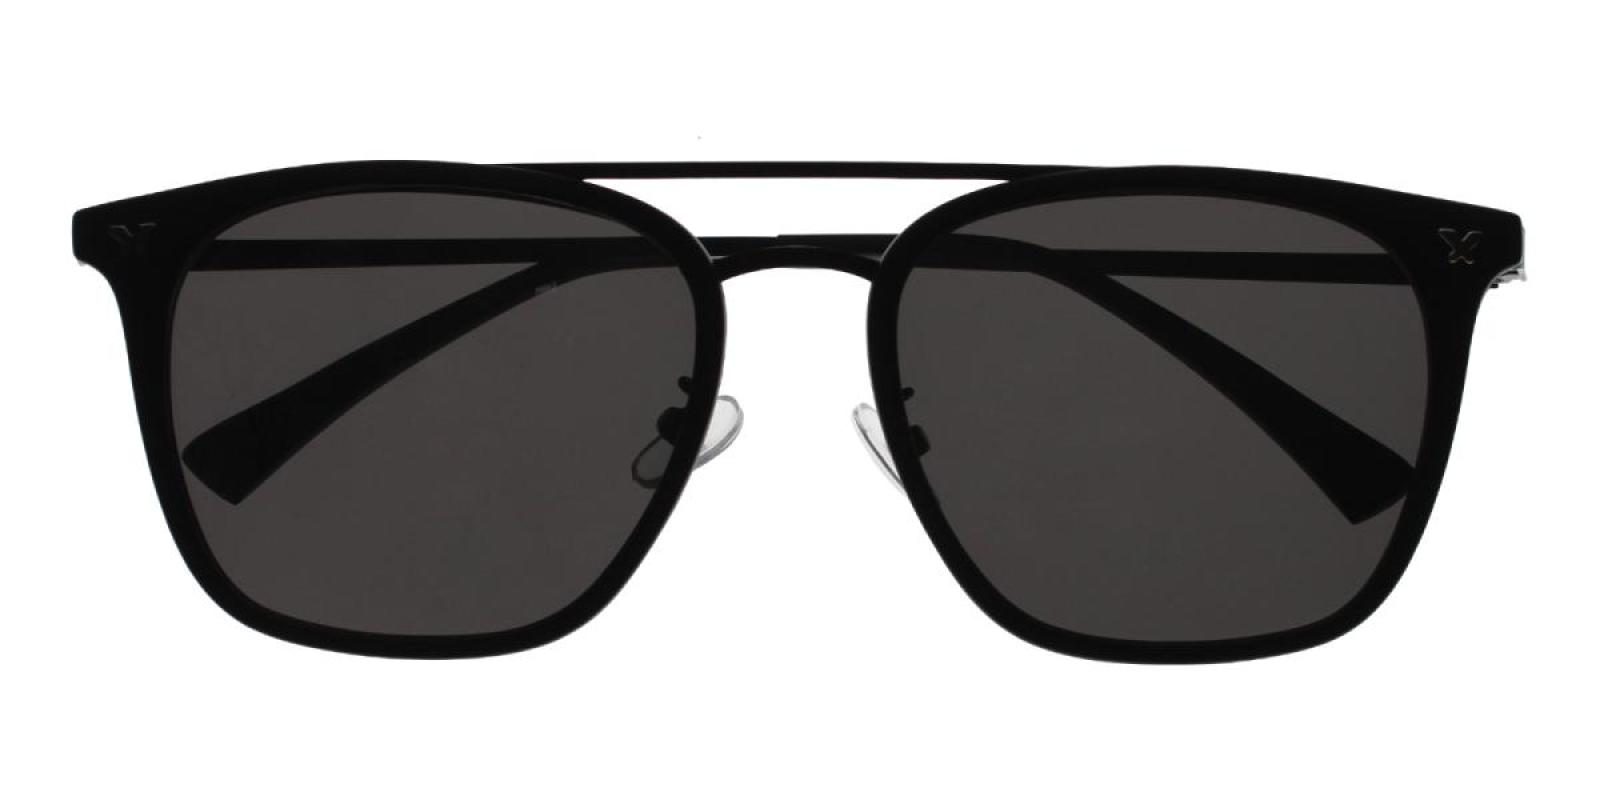 Seagual-Black-Aviator-Combination / Metal / TR-Sunglasses-detail